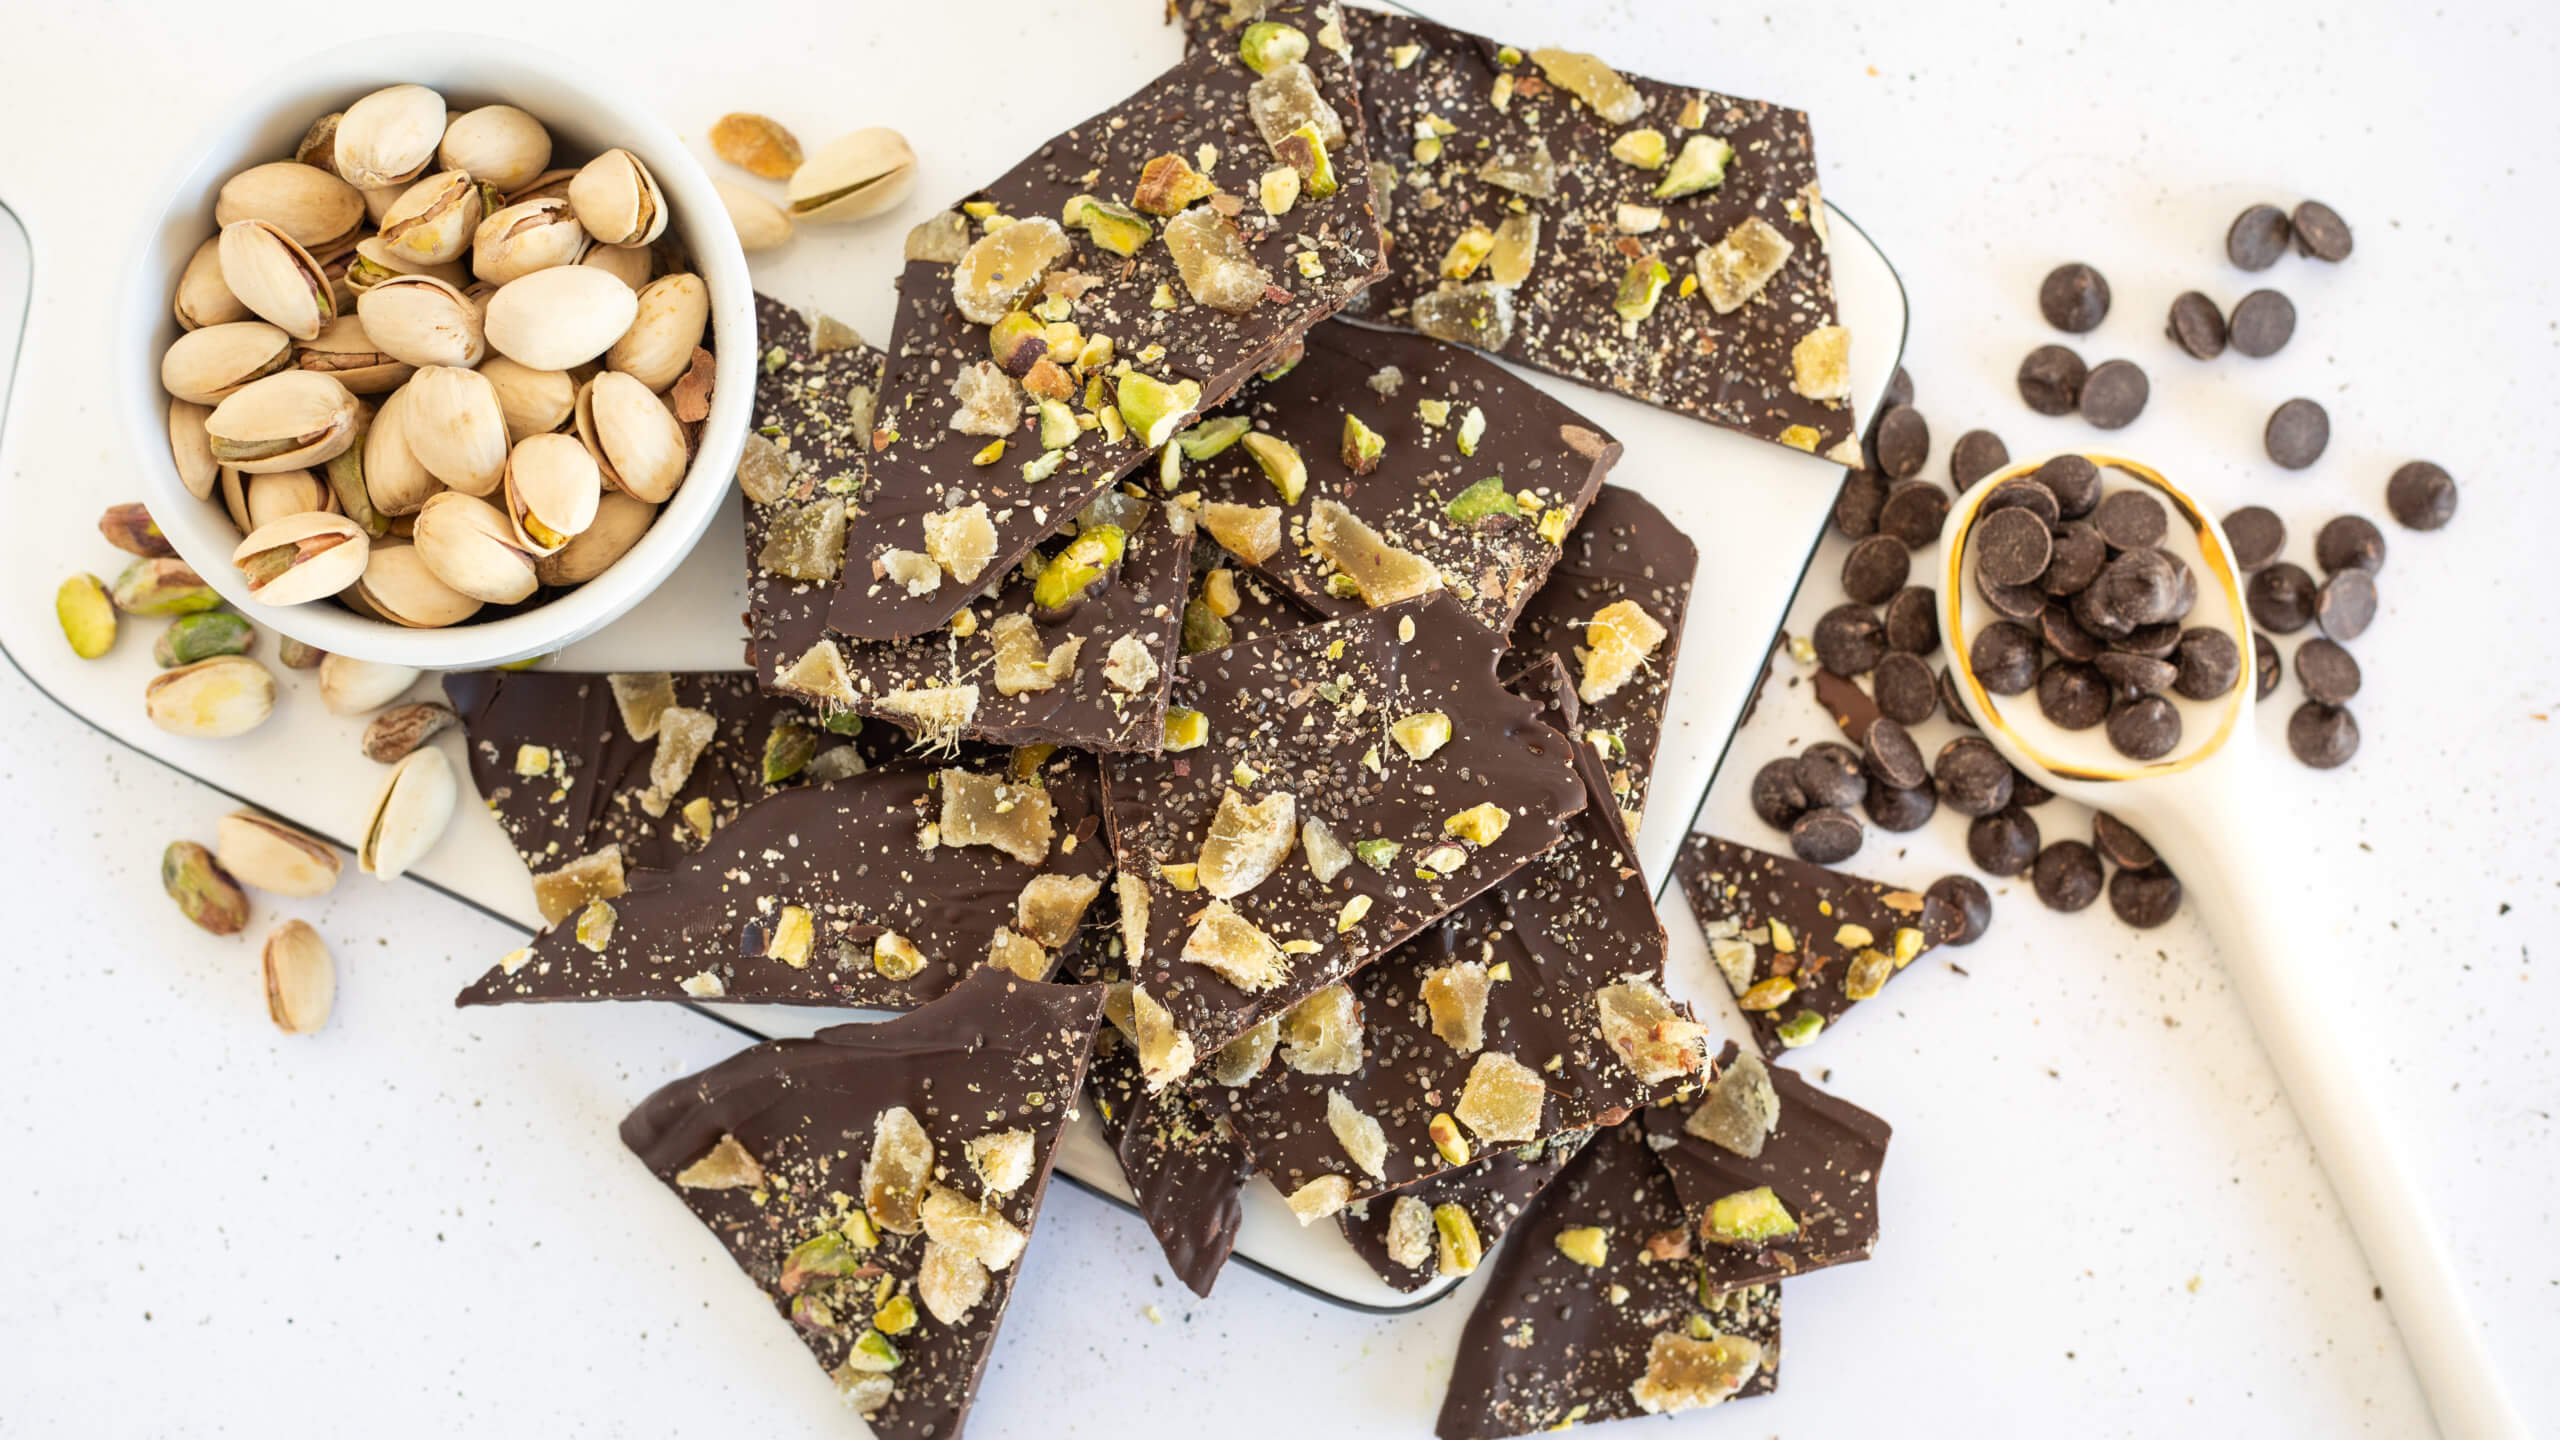 Chocolate Bark Recipe Image